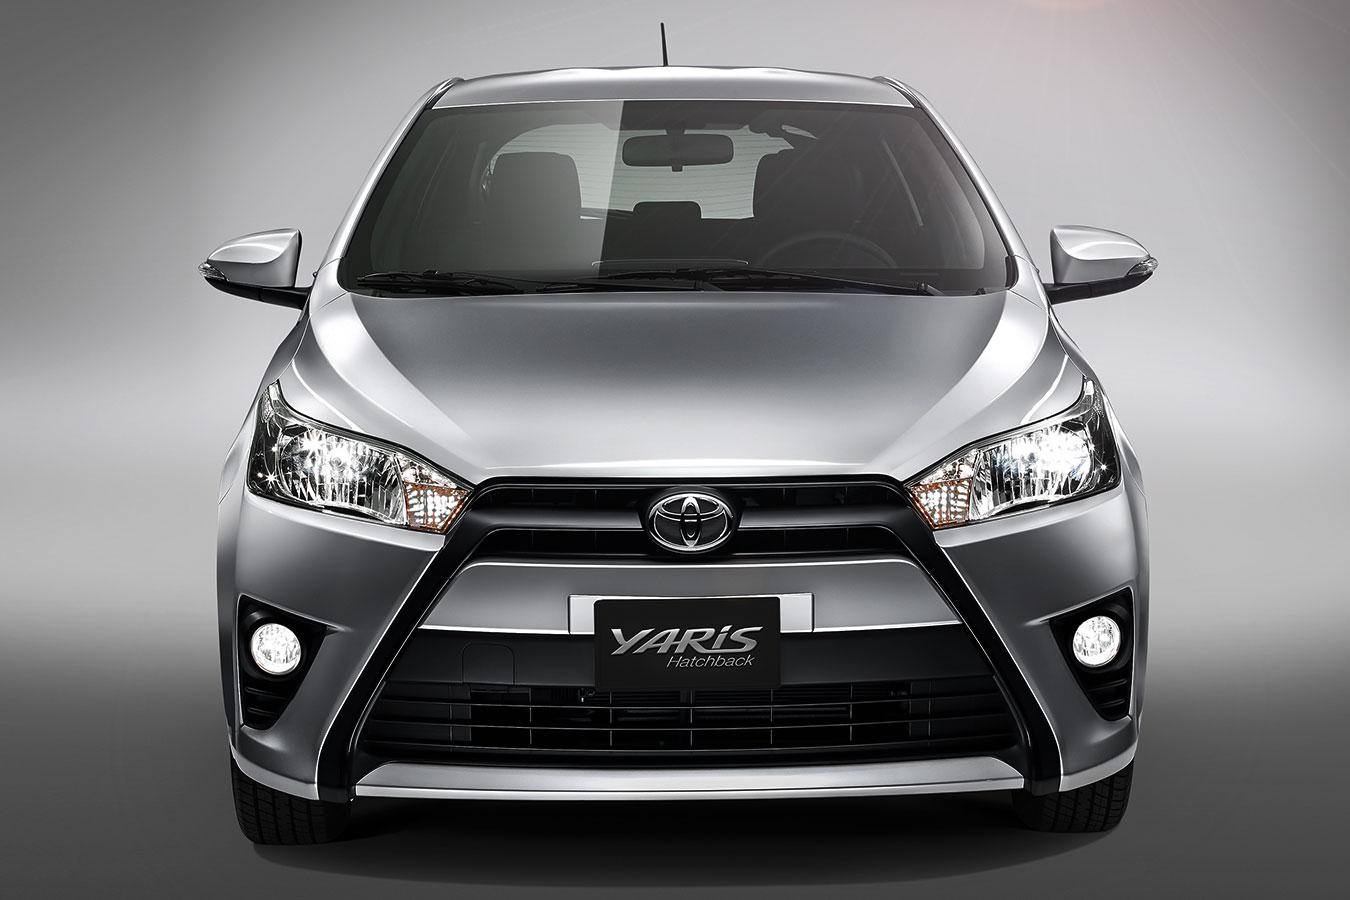 Toyota Yaris Hatchback 2017 en México frente